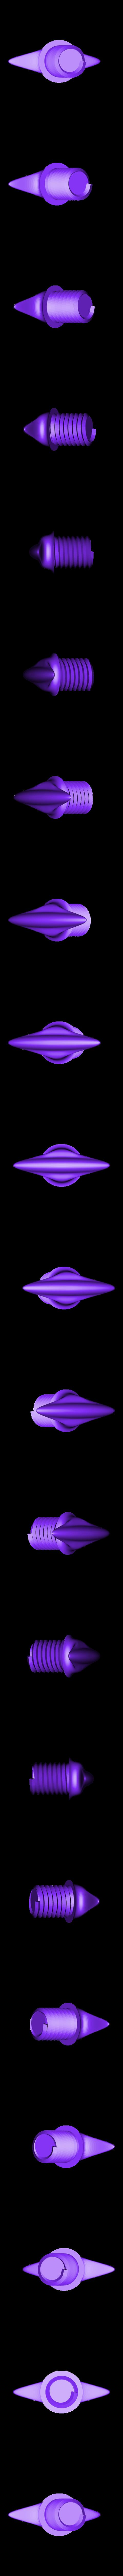 PI_vis.stl Download STL file Anal plug - Stay open • Model to 3D print, 3Dtech